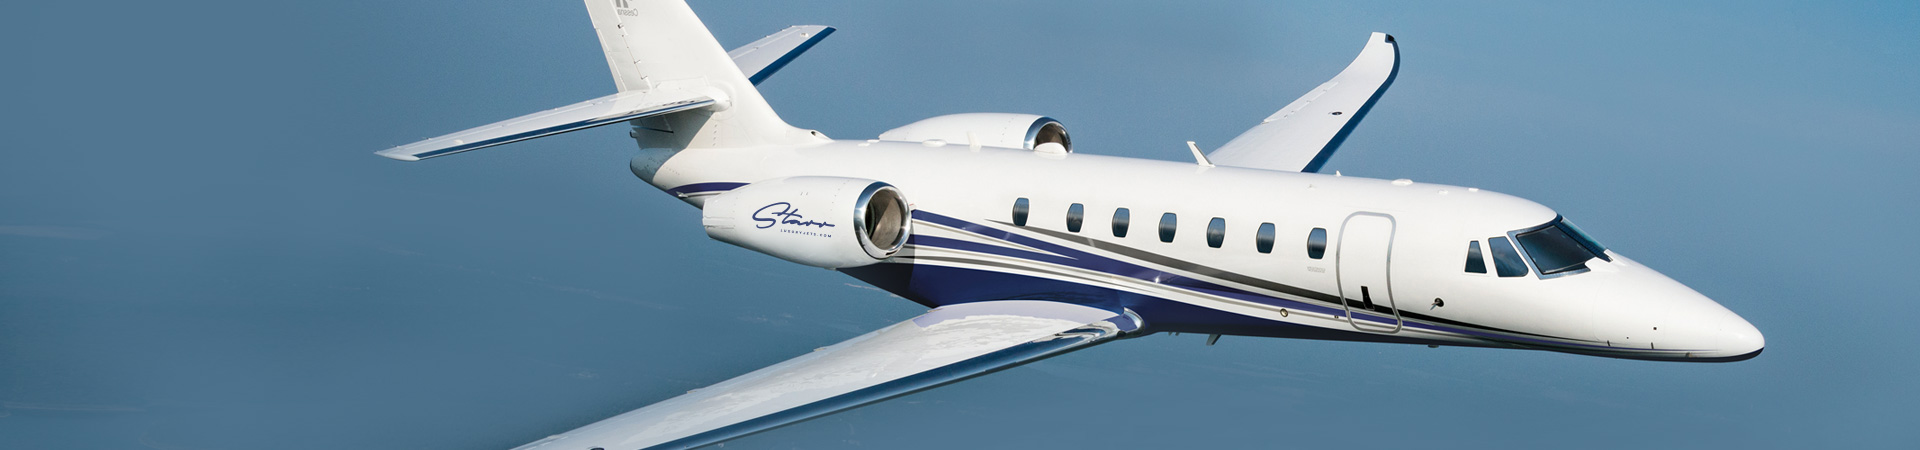 Starr Luxury Jets Medium Private Jet Aircraft Hire